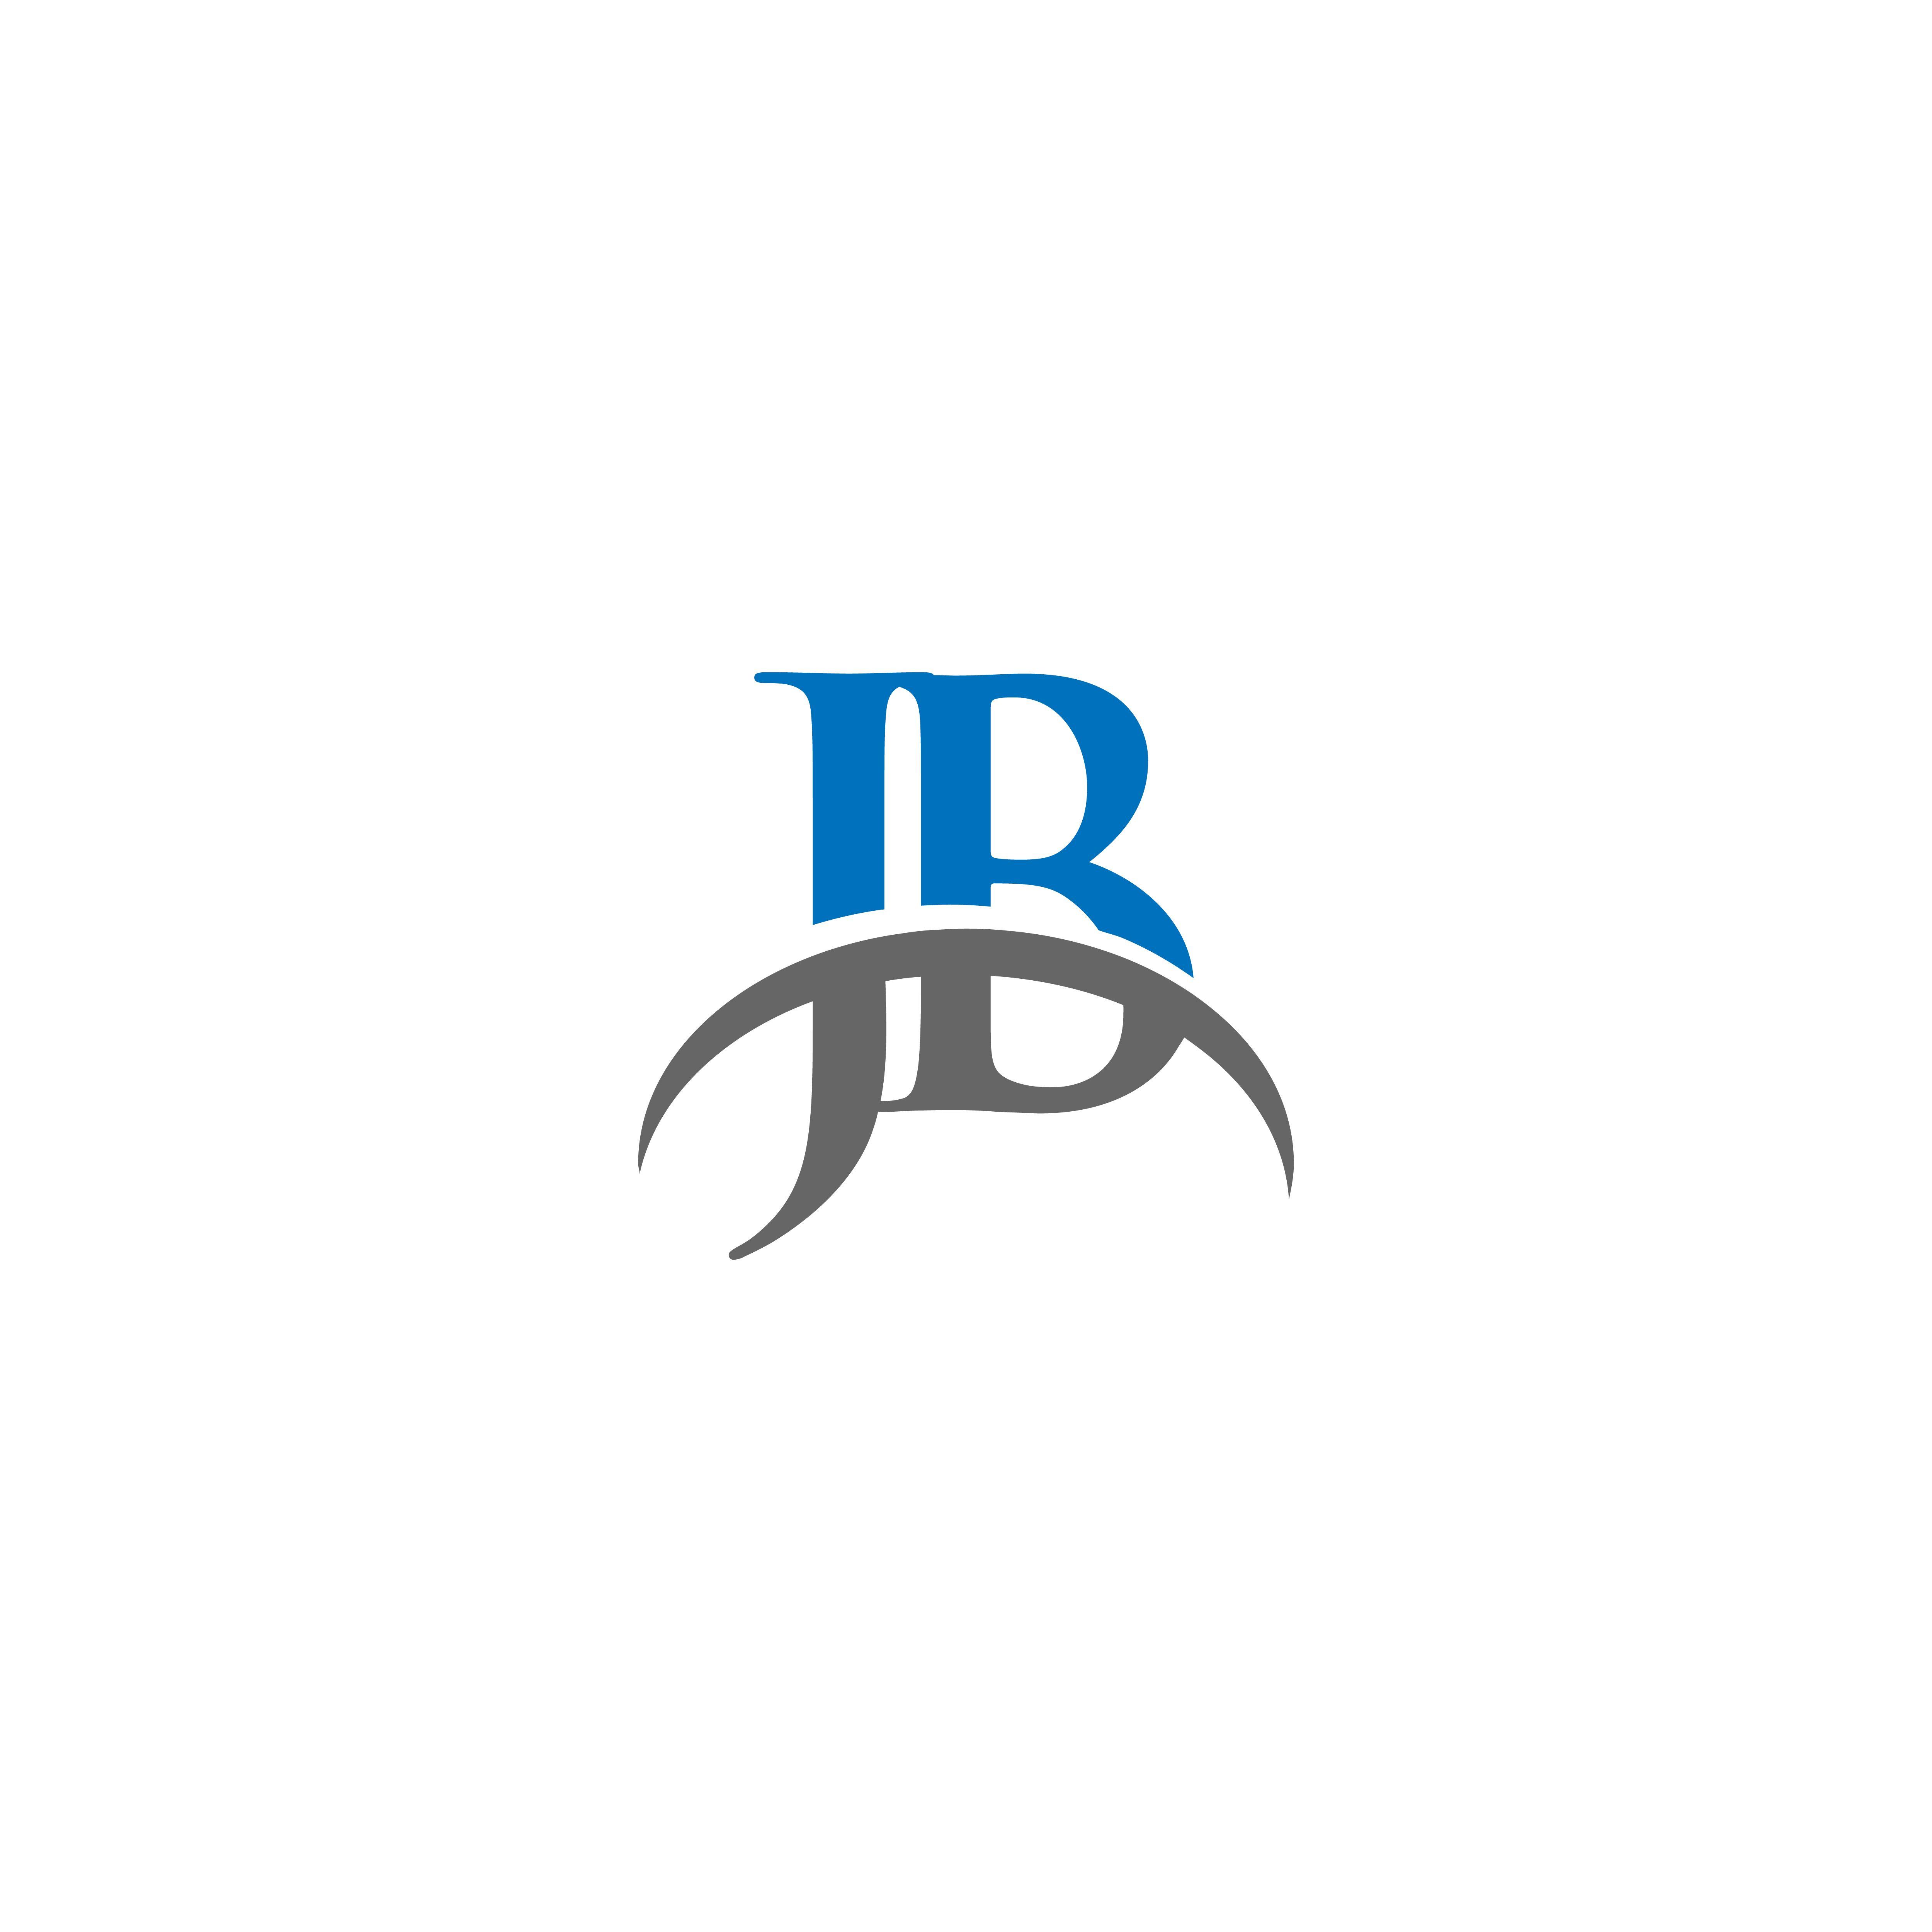 Jb Letter Logo Design Inspiration Vector Letter Logo Design Jb Logo Letter Logo